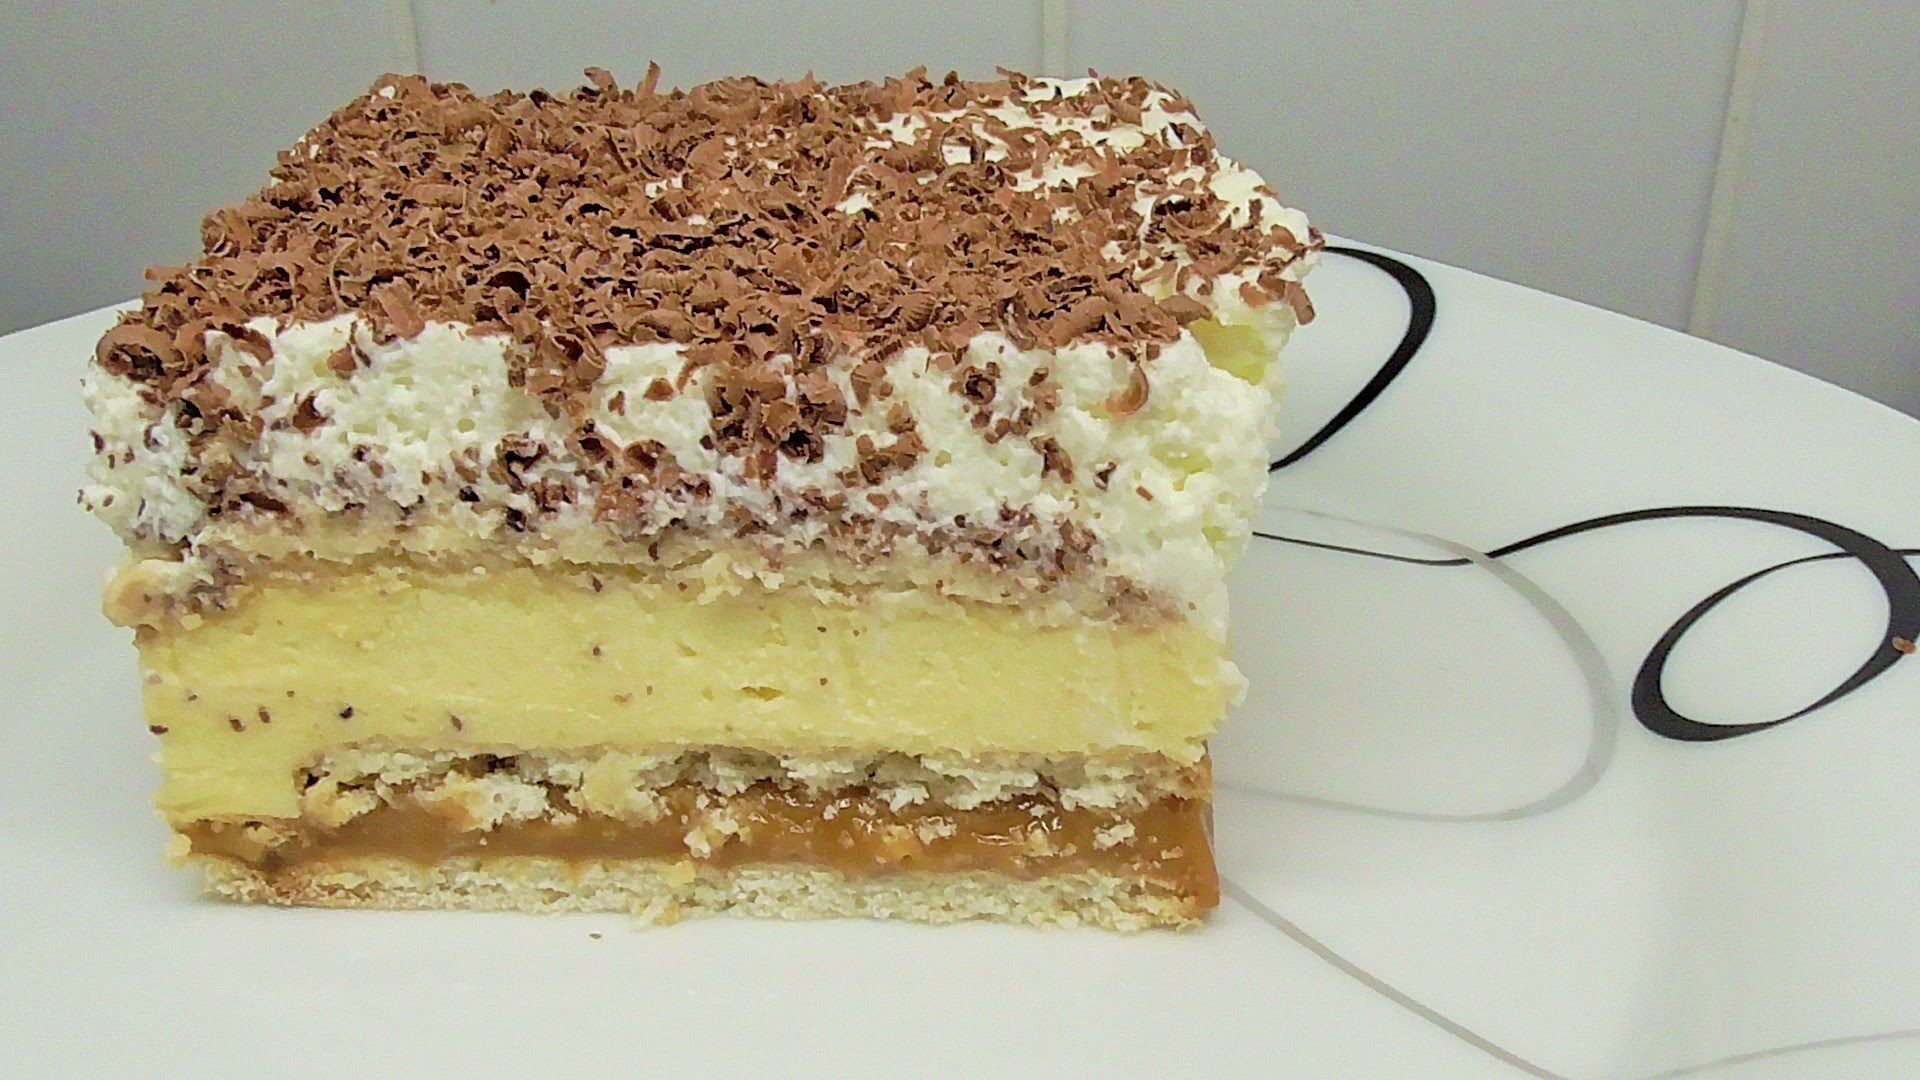 Leckere kuchen mit karamell ohne backen 3 bit kuchen - Pinterest kuchen ...